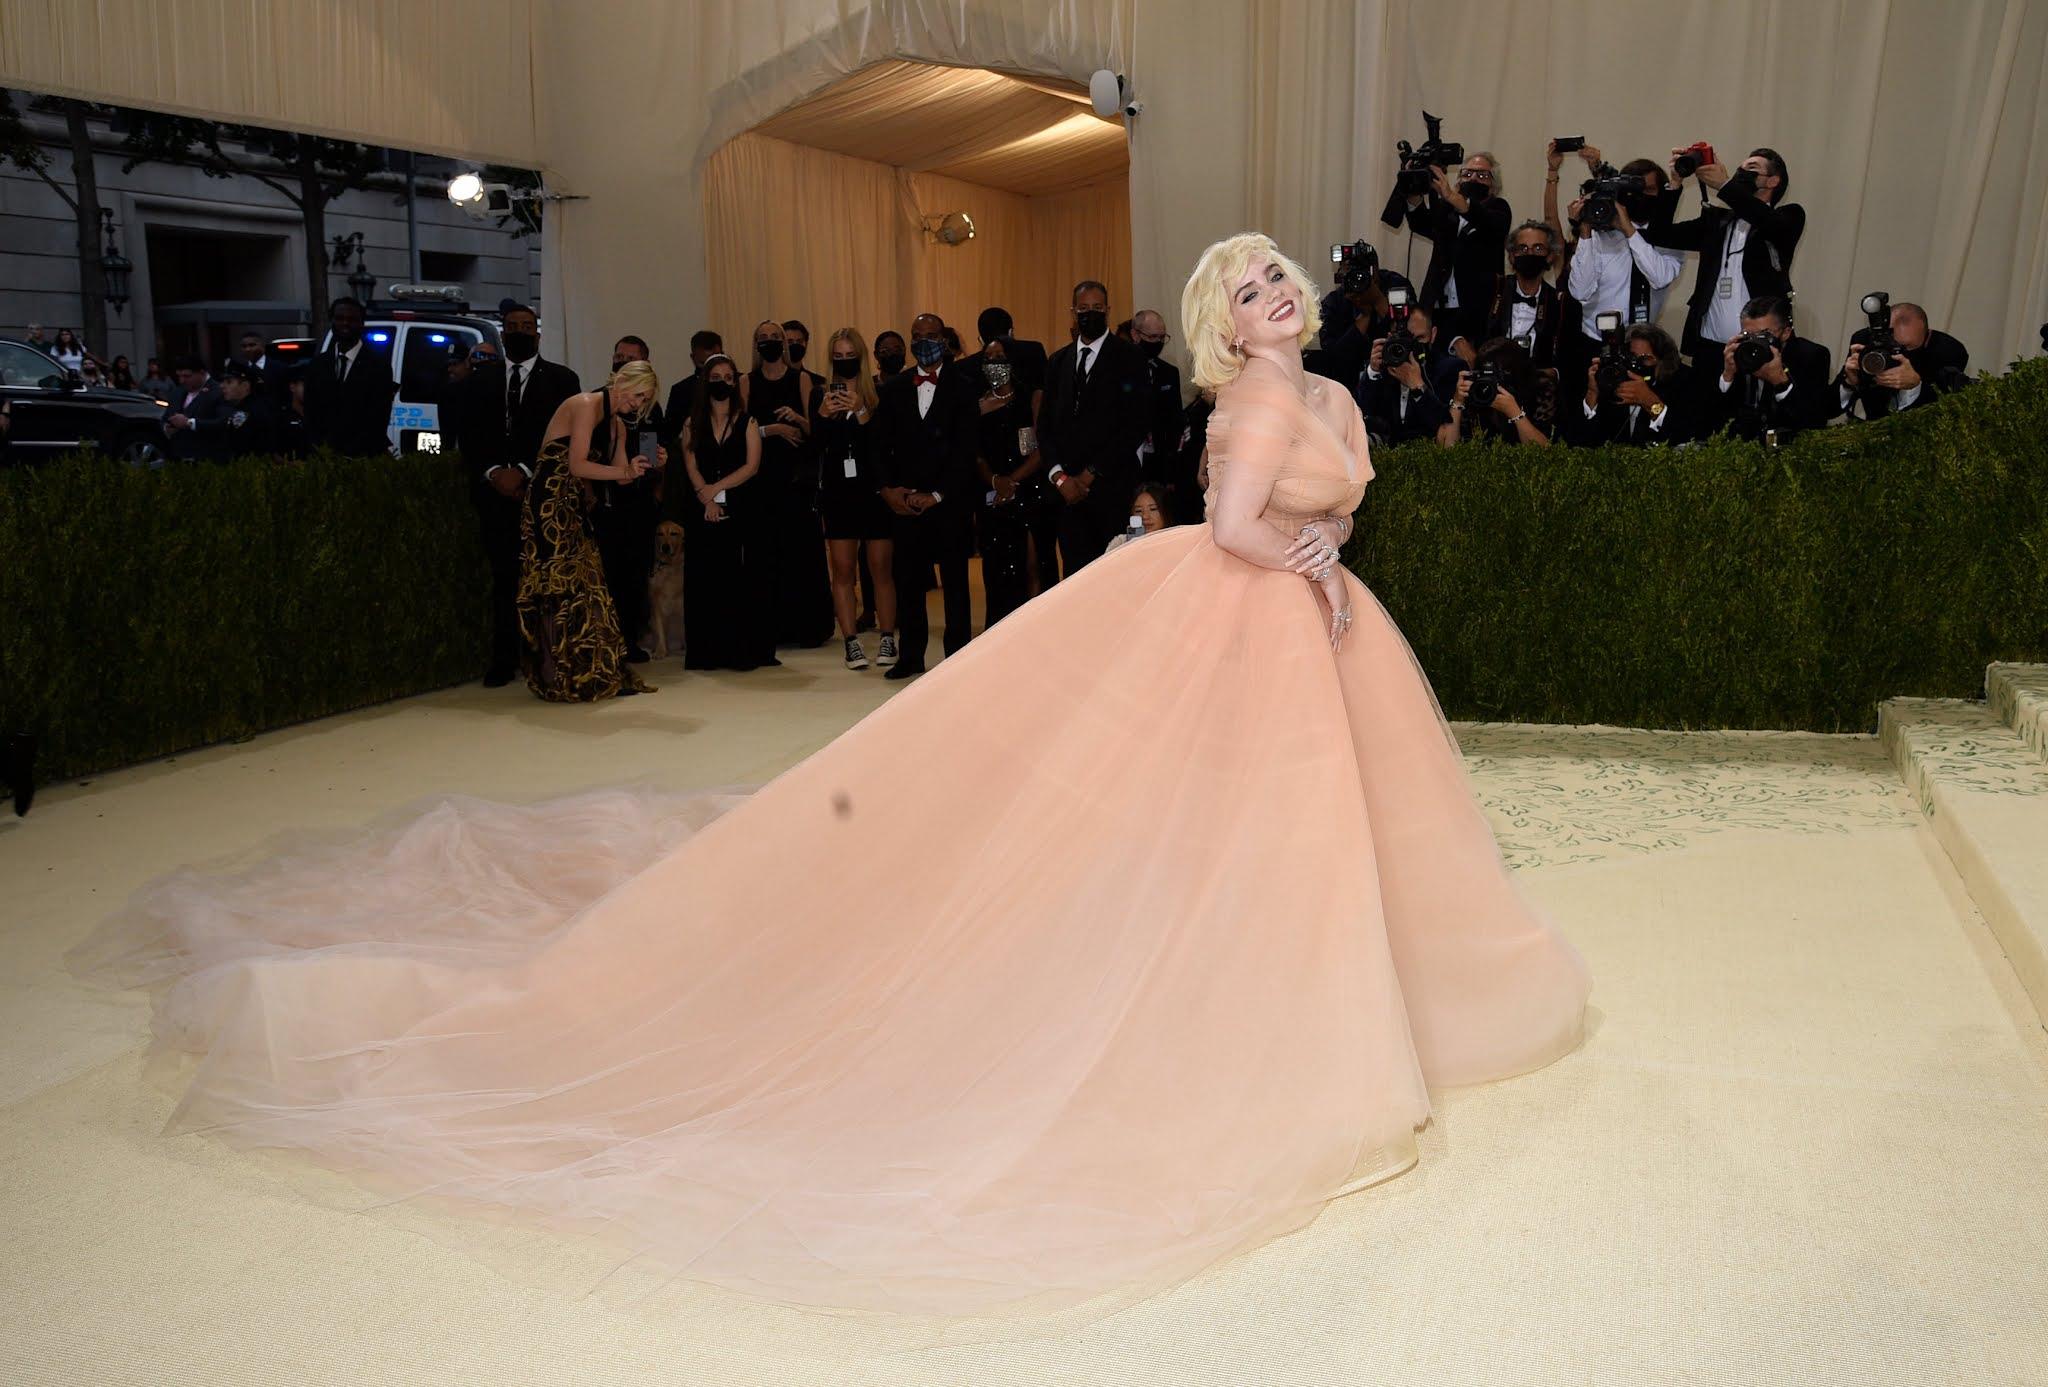 Billie Eilish brings Hollywood glamour to the 2021 Met Gala